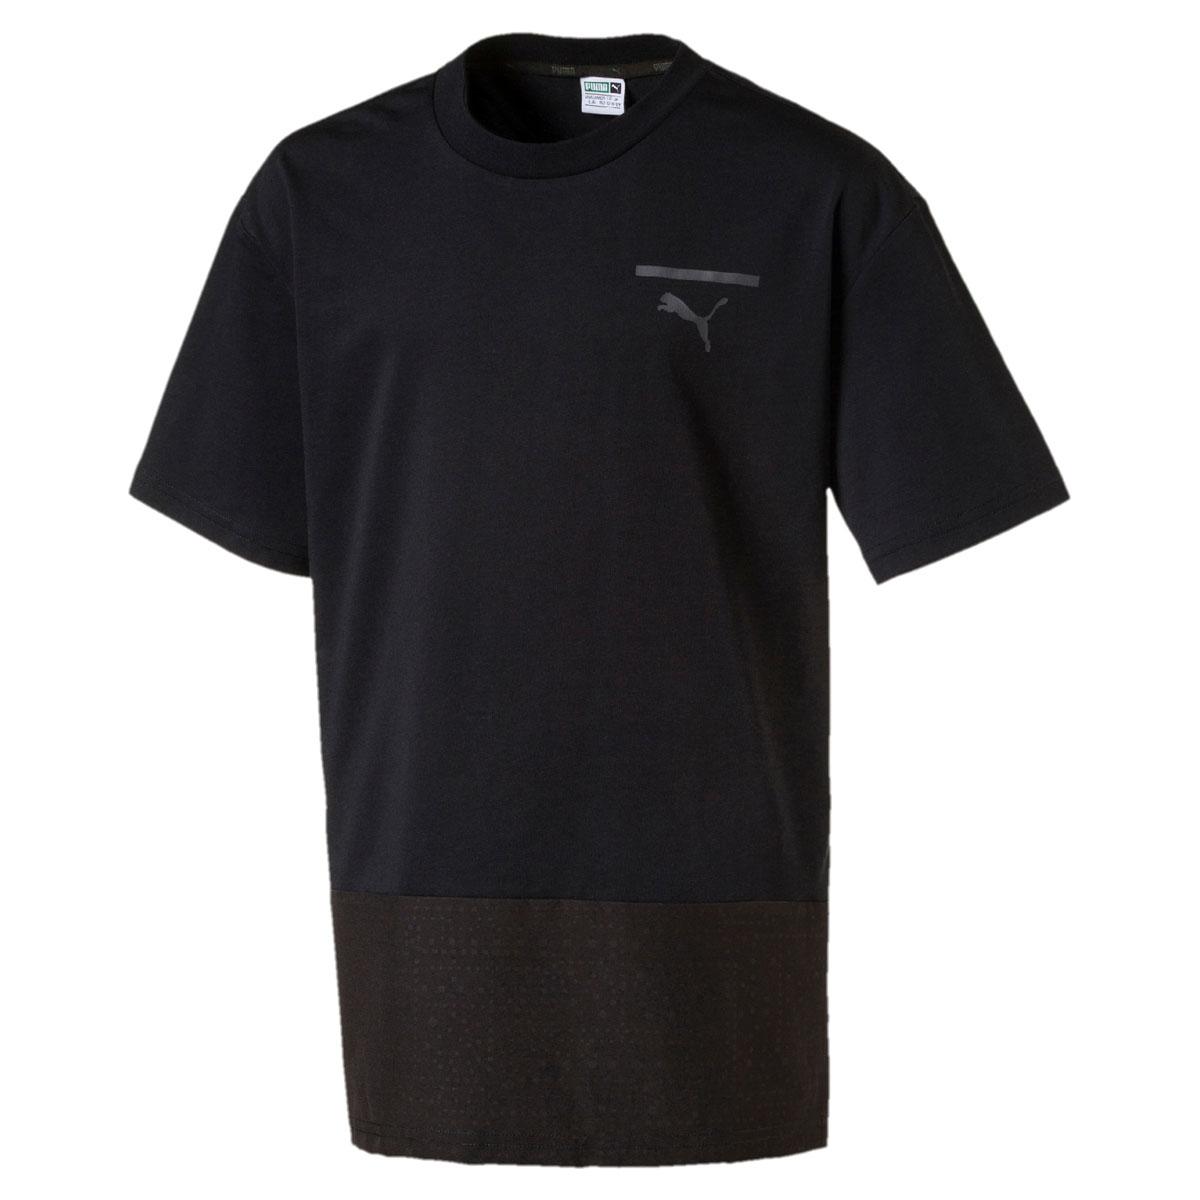 Футболка для мальчика Puma Pace Tee, цвет: черный. 850245017. Размер 164 original new arrival 2018 puma pace primary fz hoody men s jacket sportswear